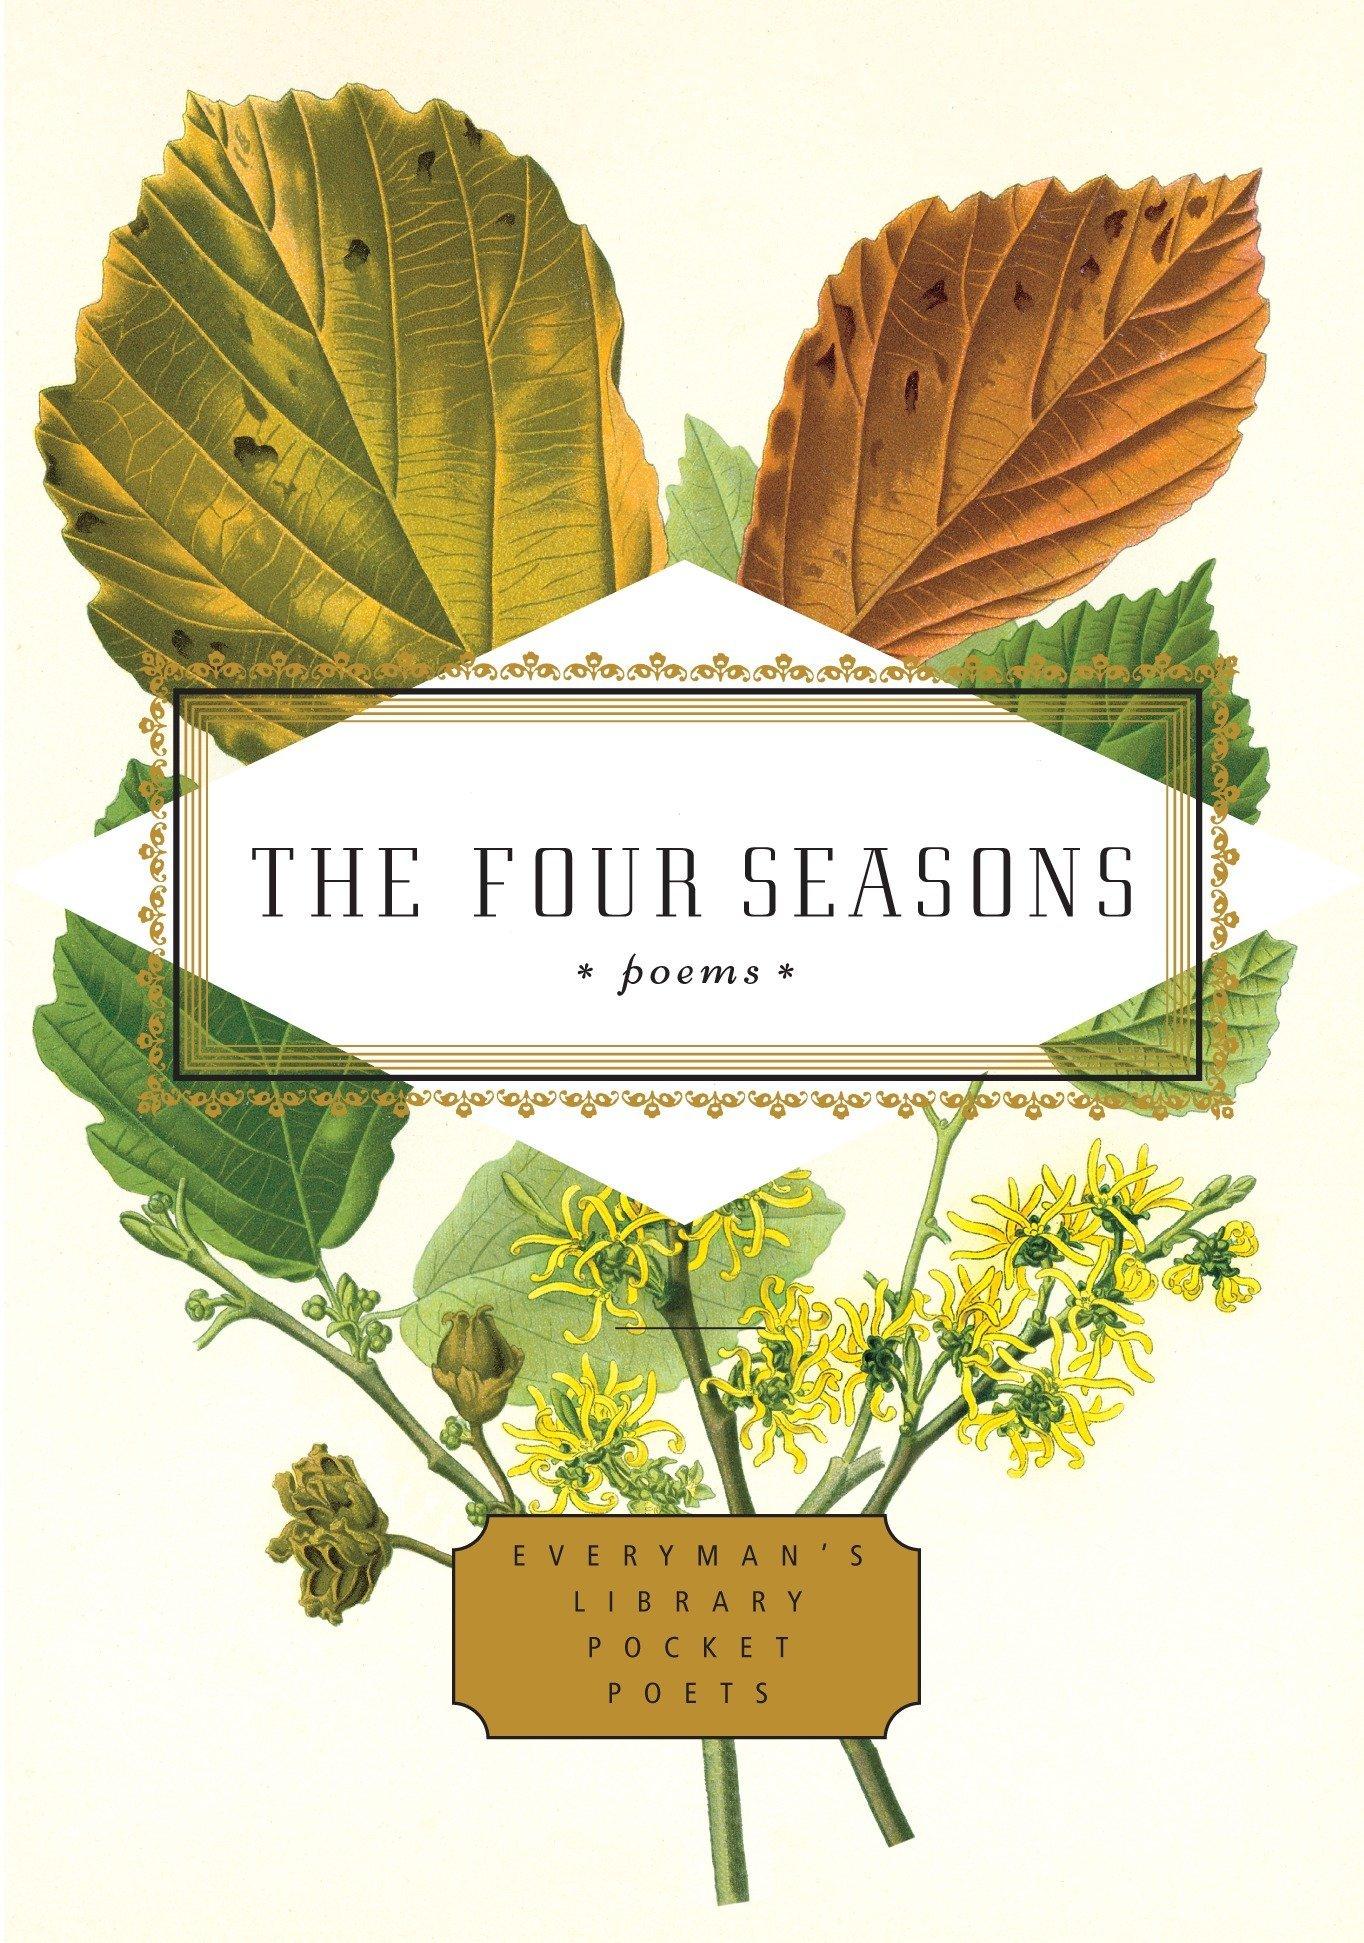 Download The Four Seasons: Poems (Everyman's Library Pocket Poets Series) PDF